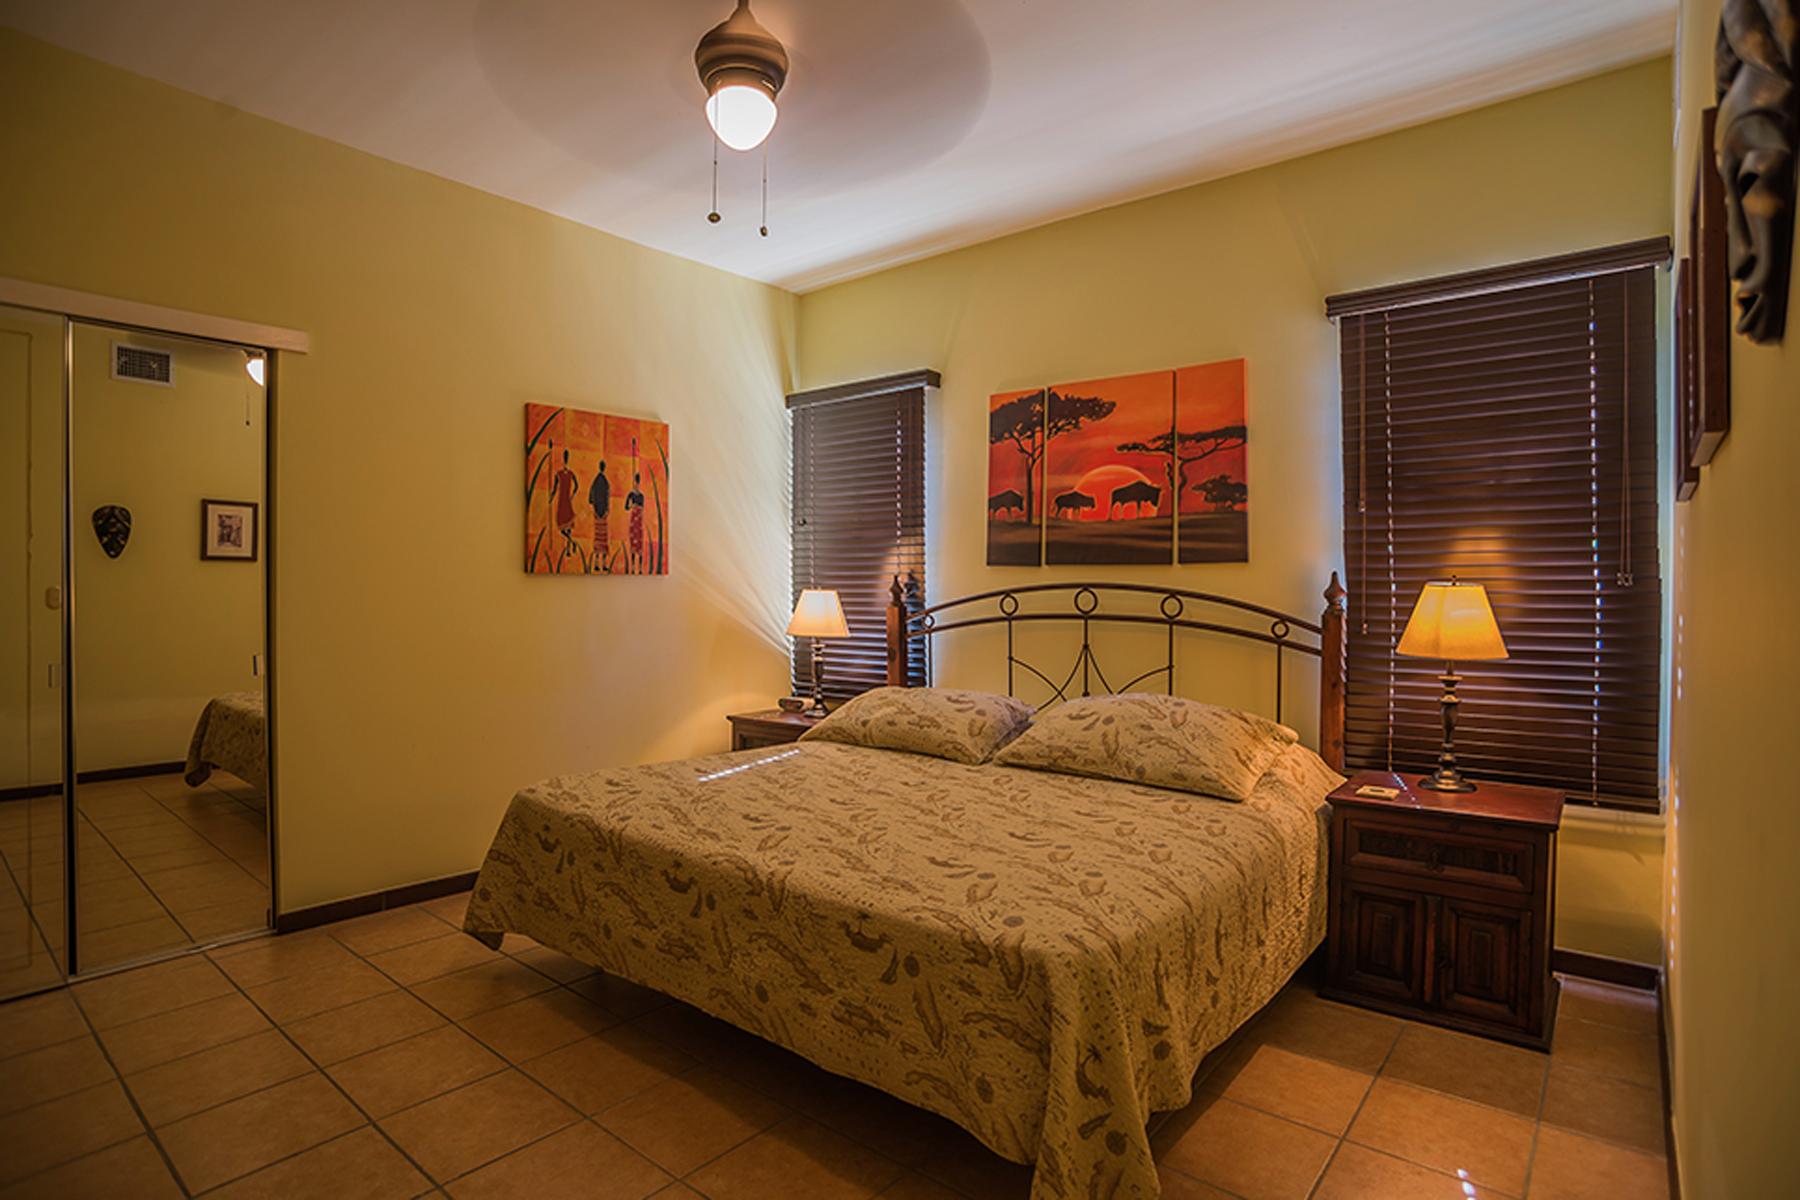 Additional photo for property listing at Sea Breeze 20D Caya di Baranca 20D Las Rocas Malmok, Aruba 00000 Aruba